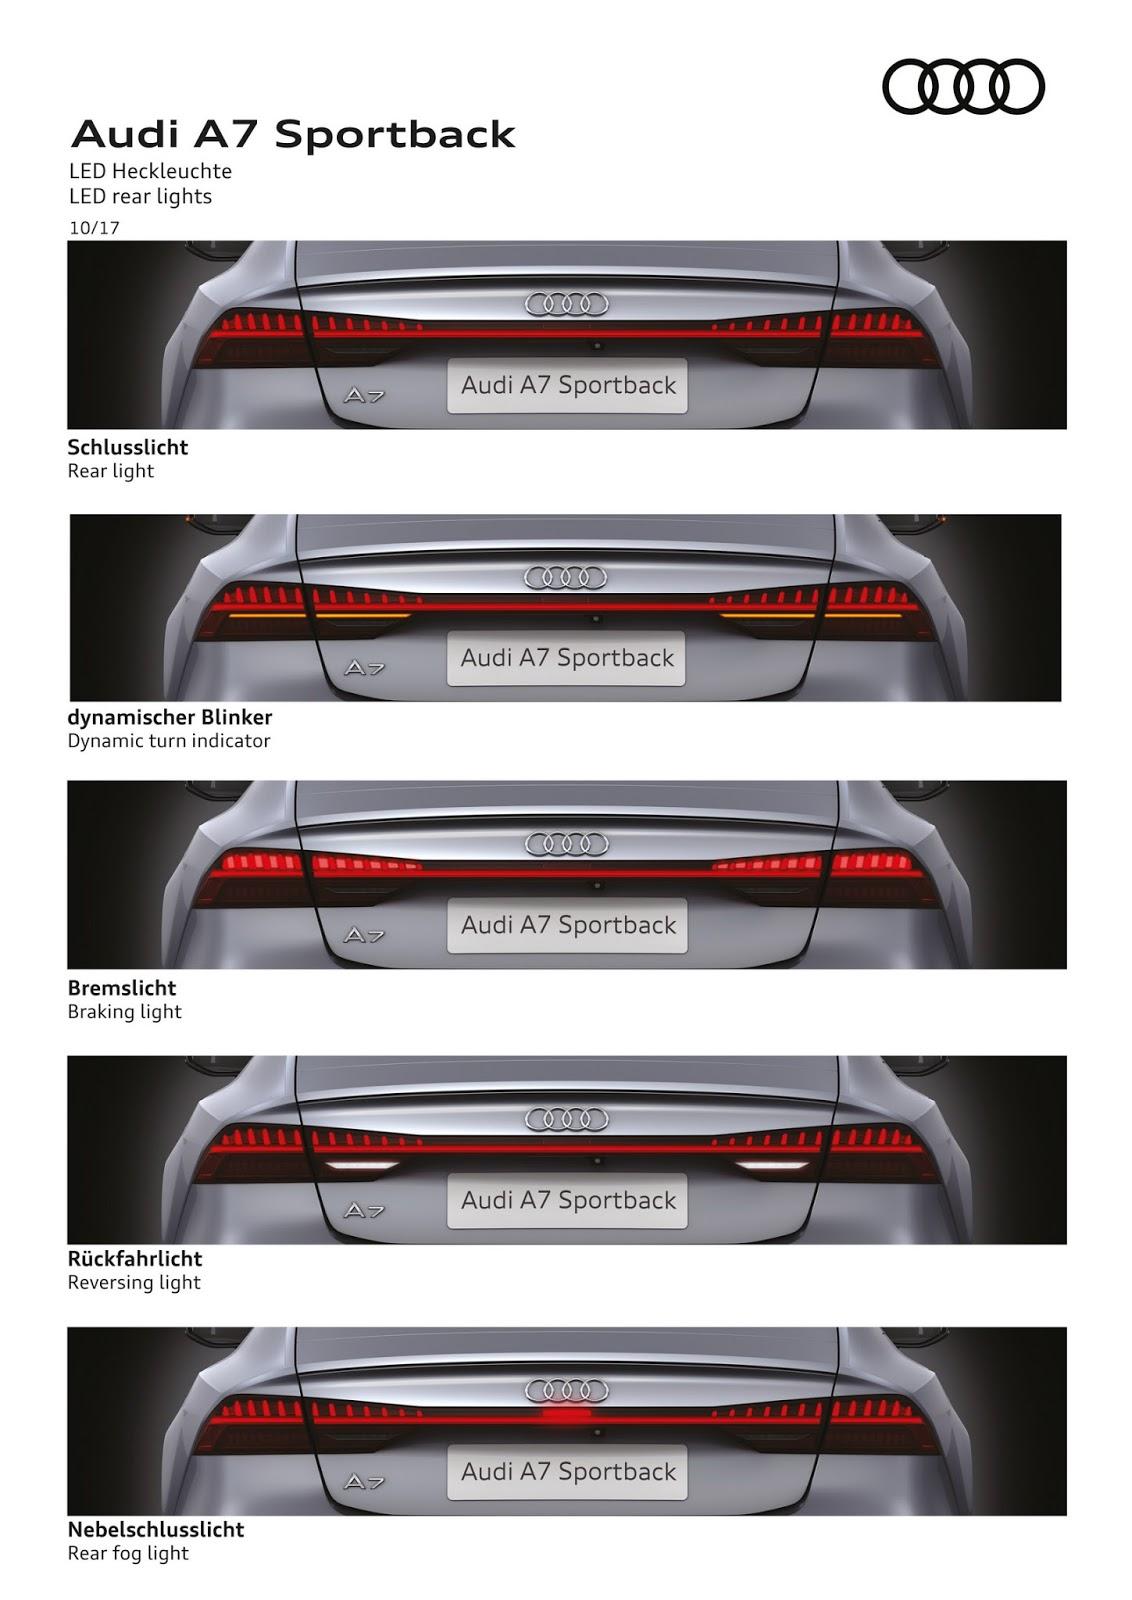 2018_Audi_A7_Sportback_0050